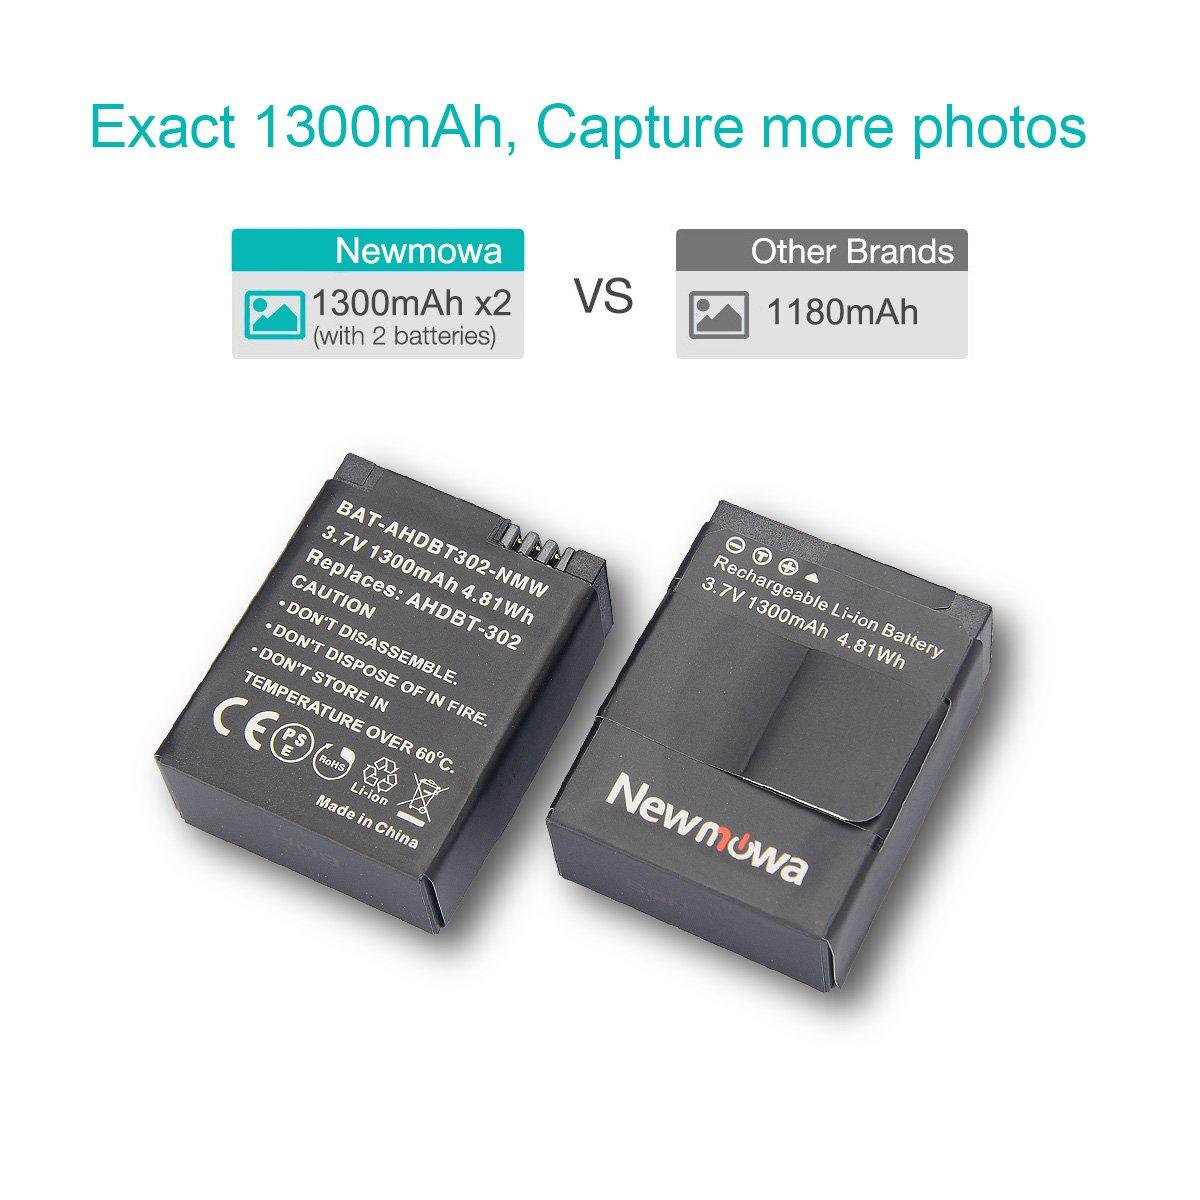 confezione da 2 and Rapid 3-Channel Caricatore per Gopro AHDBT-401 and Gopro Hero 4 Camera Newmowa 1200mAh Rechargeable AHDBT-401 Batteria